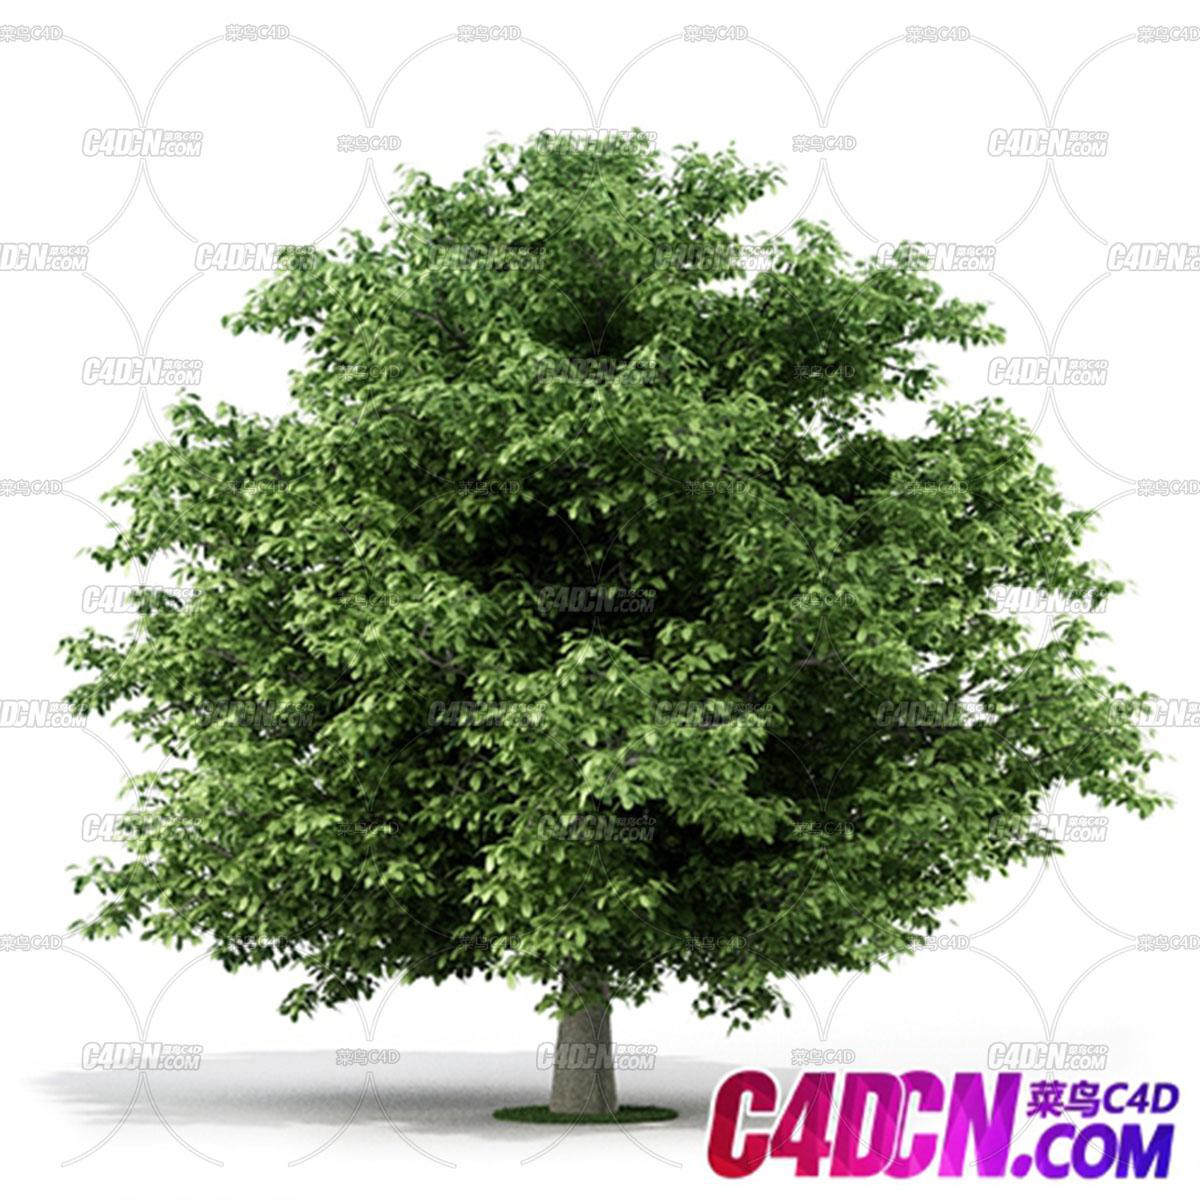 C4D模型 繁茂绿叶大树